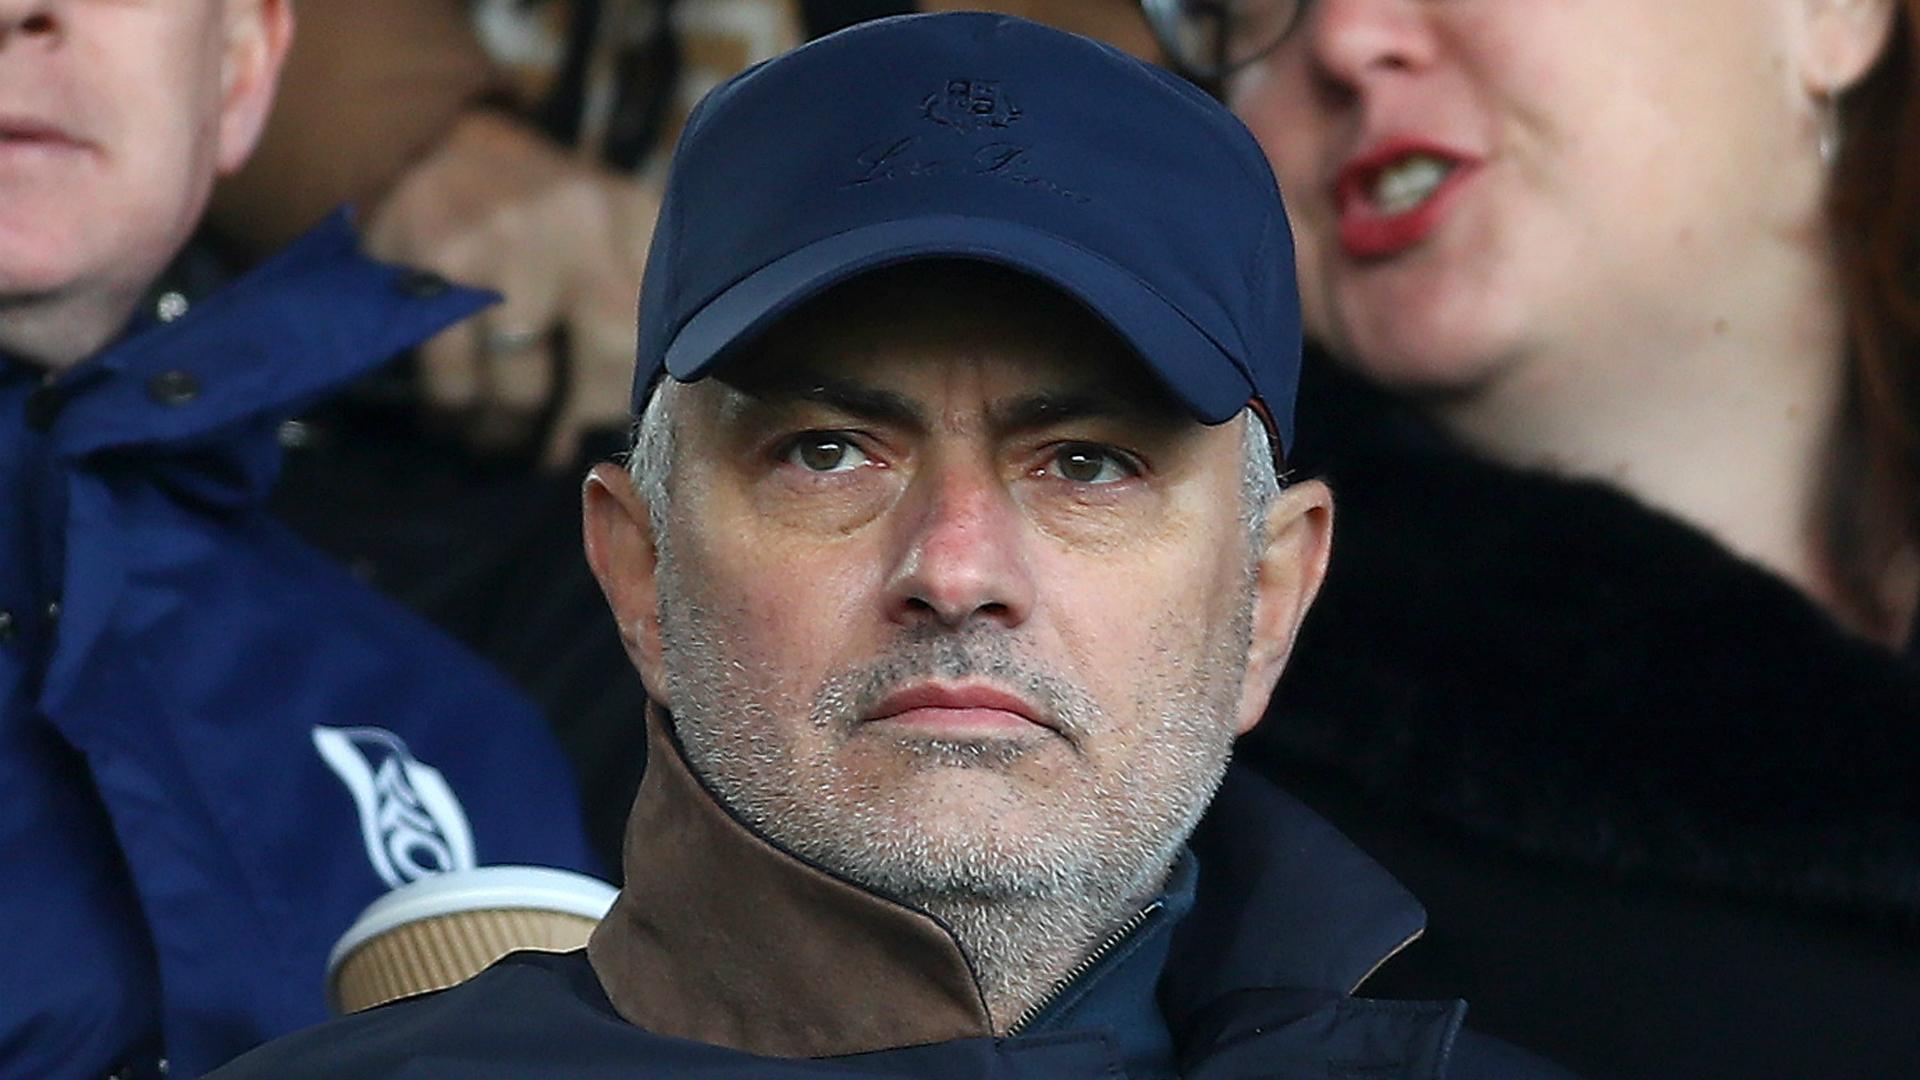 'I can imagine Mourinho in Germany' - Schweinsteiger backs ex-Man Utd boss for Bayern Munich job